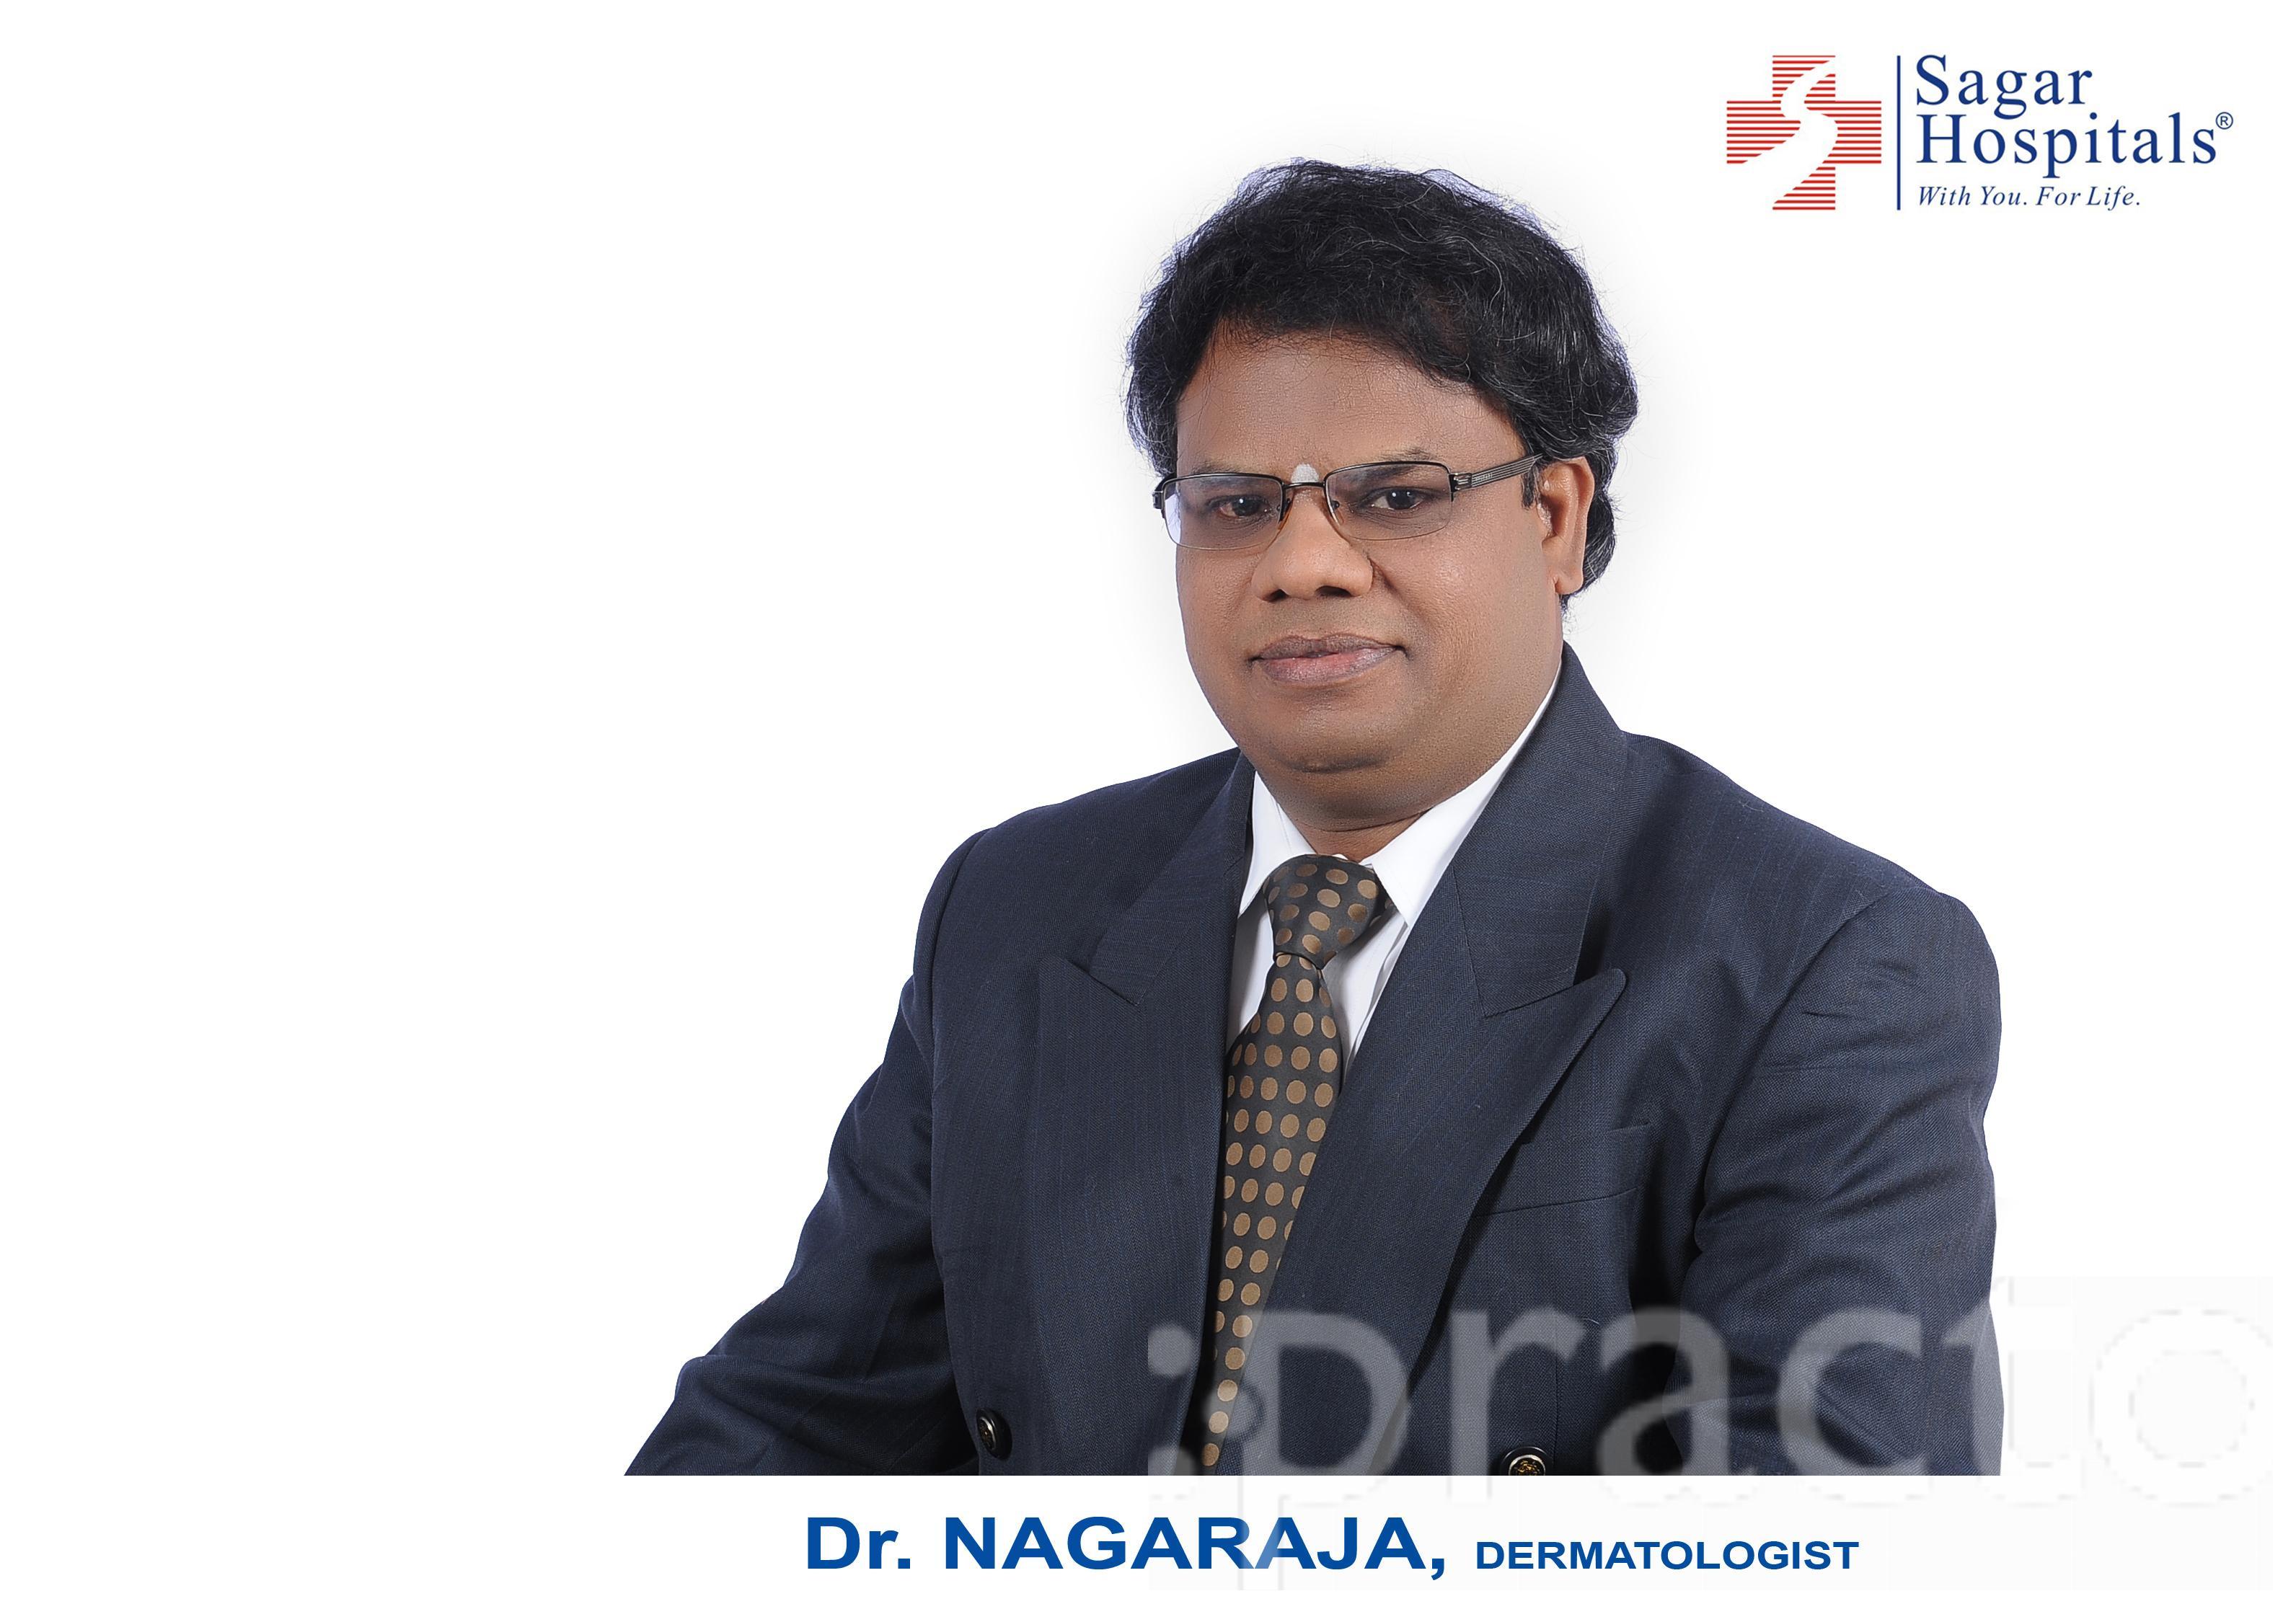 Dr. Nagaraja - Dermatologist